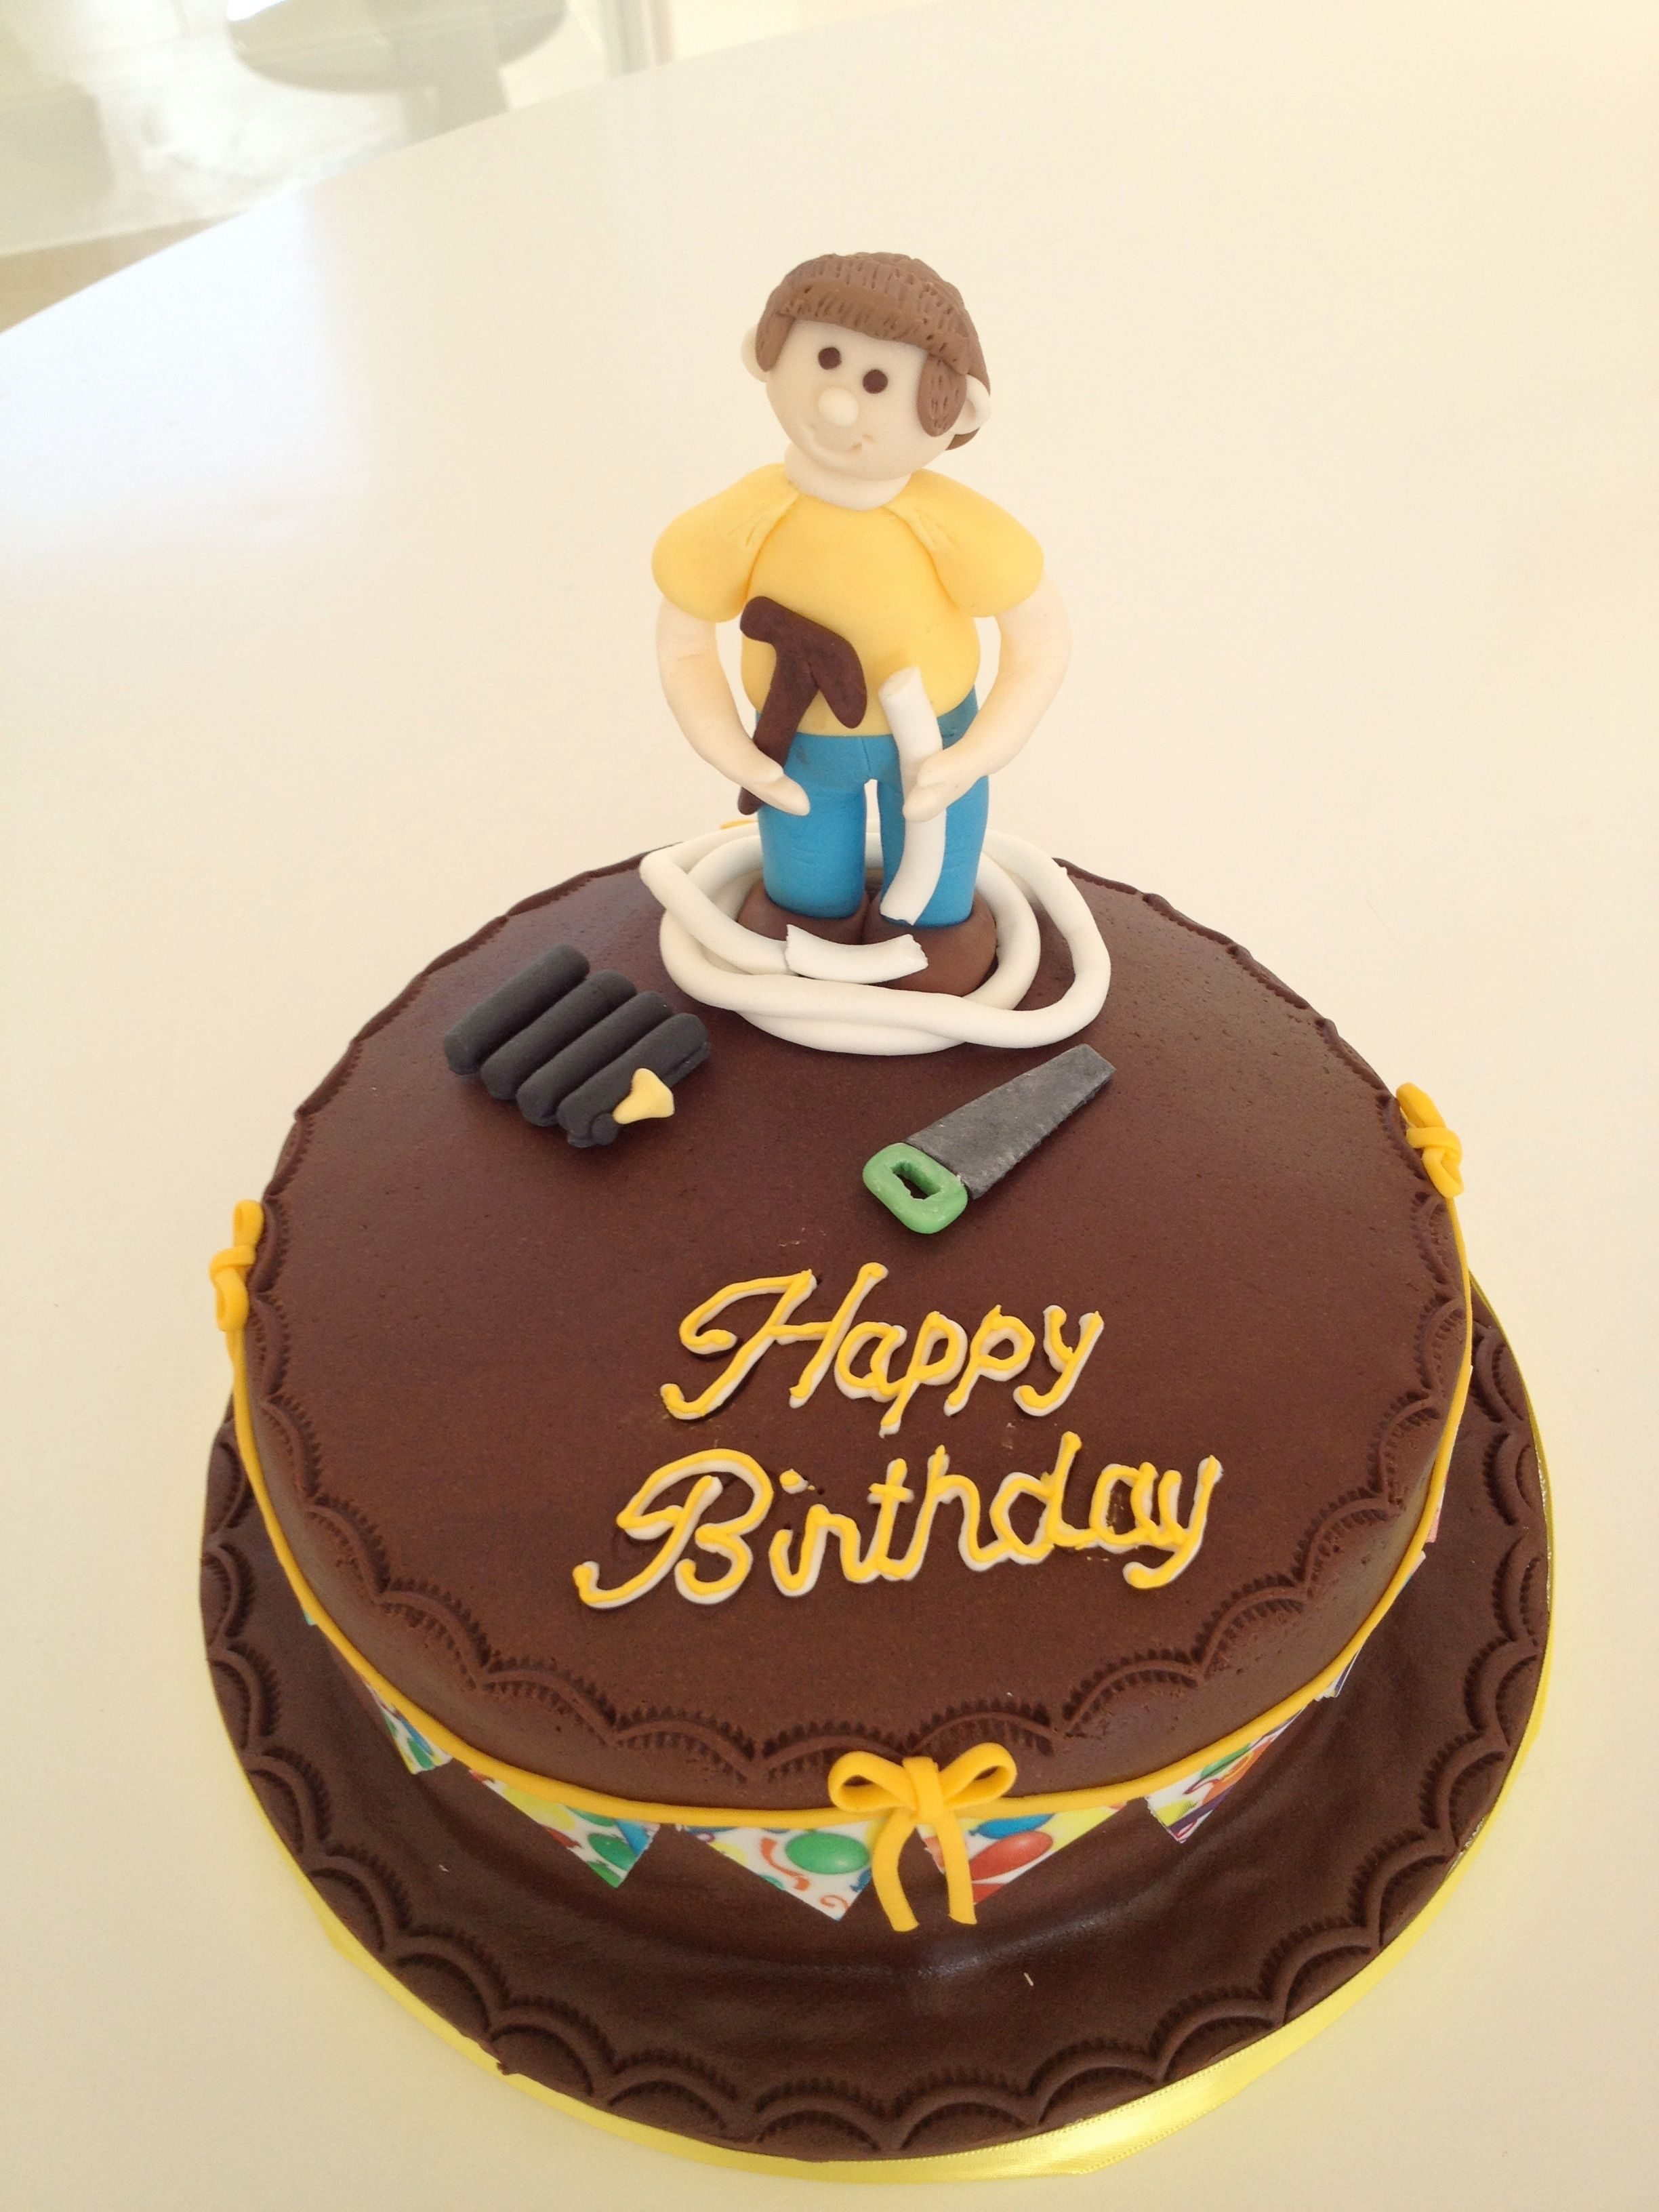 The plumber cake infocakesbypennyandsuecouk Decorating cake